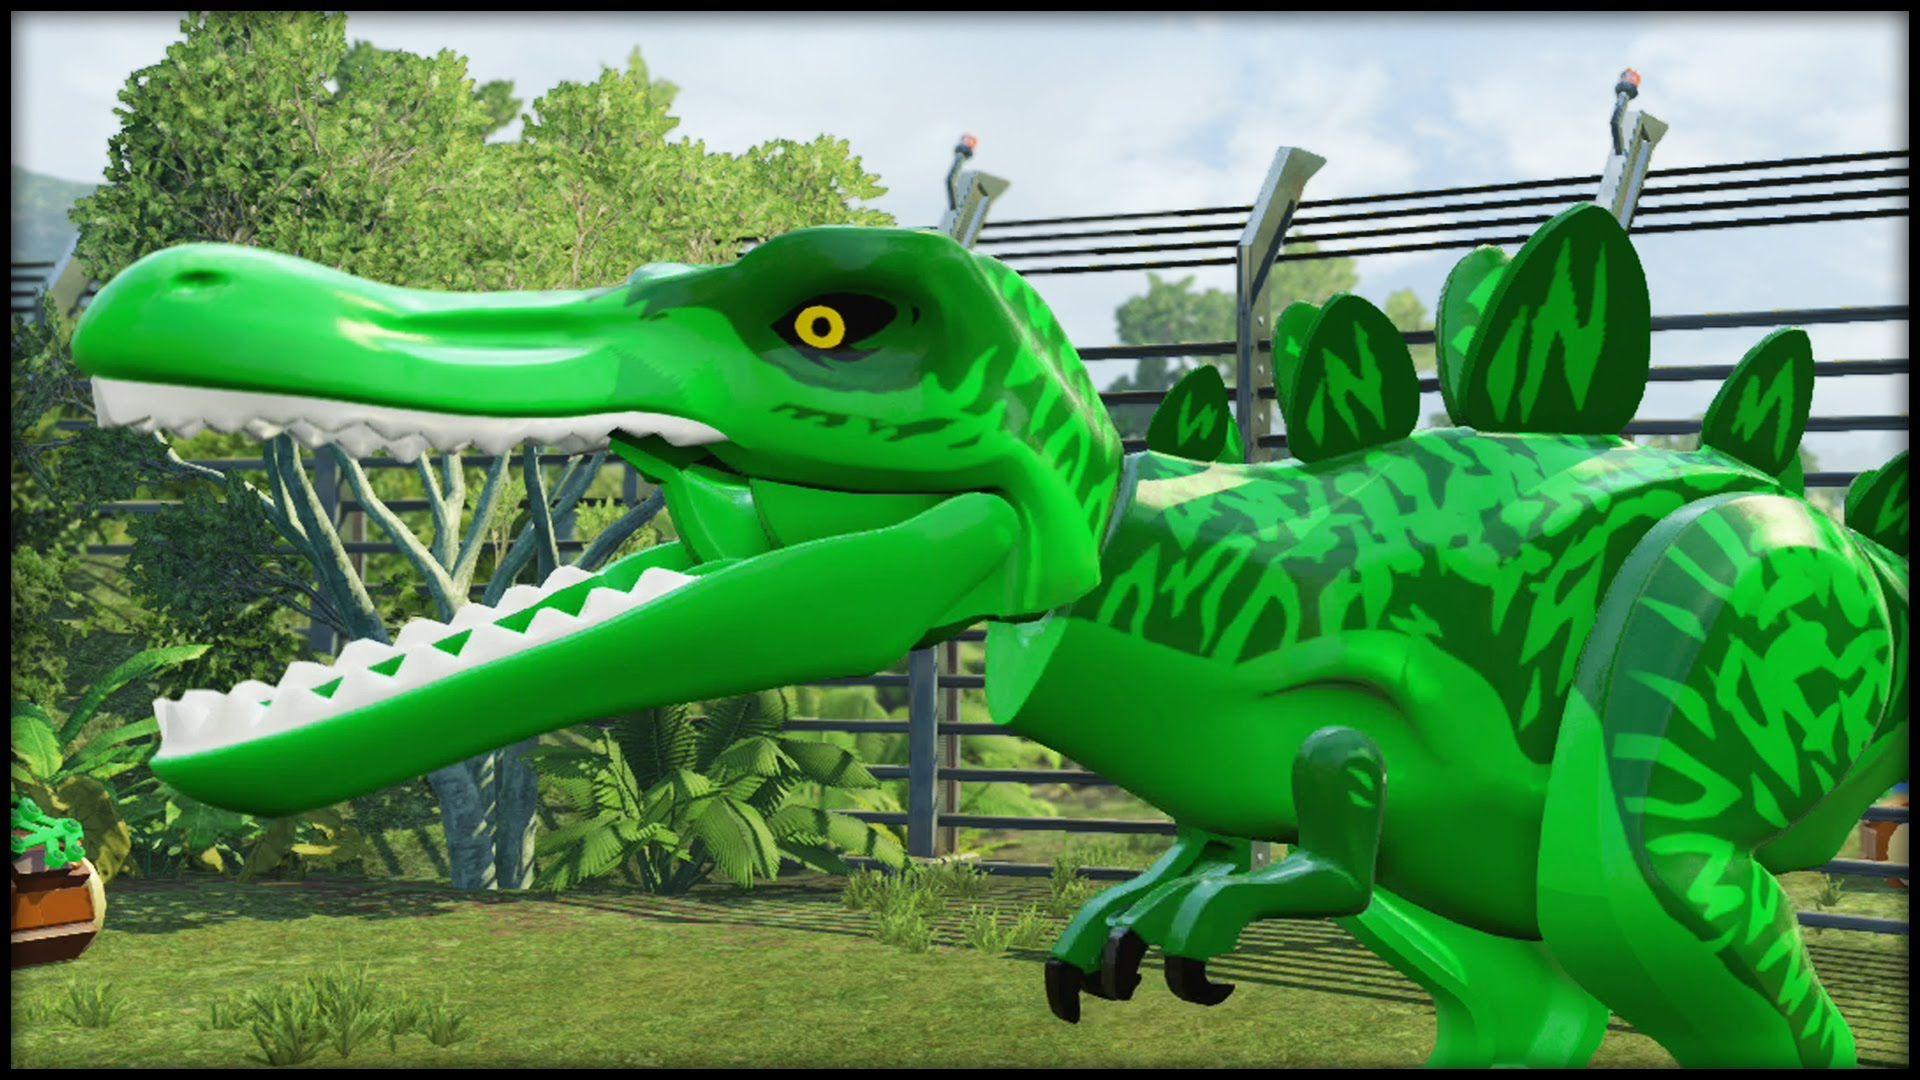 Lego Jurassic World Beast Boy T Rex Jurassic Park And World